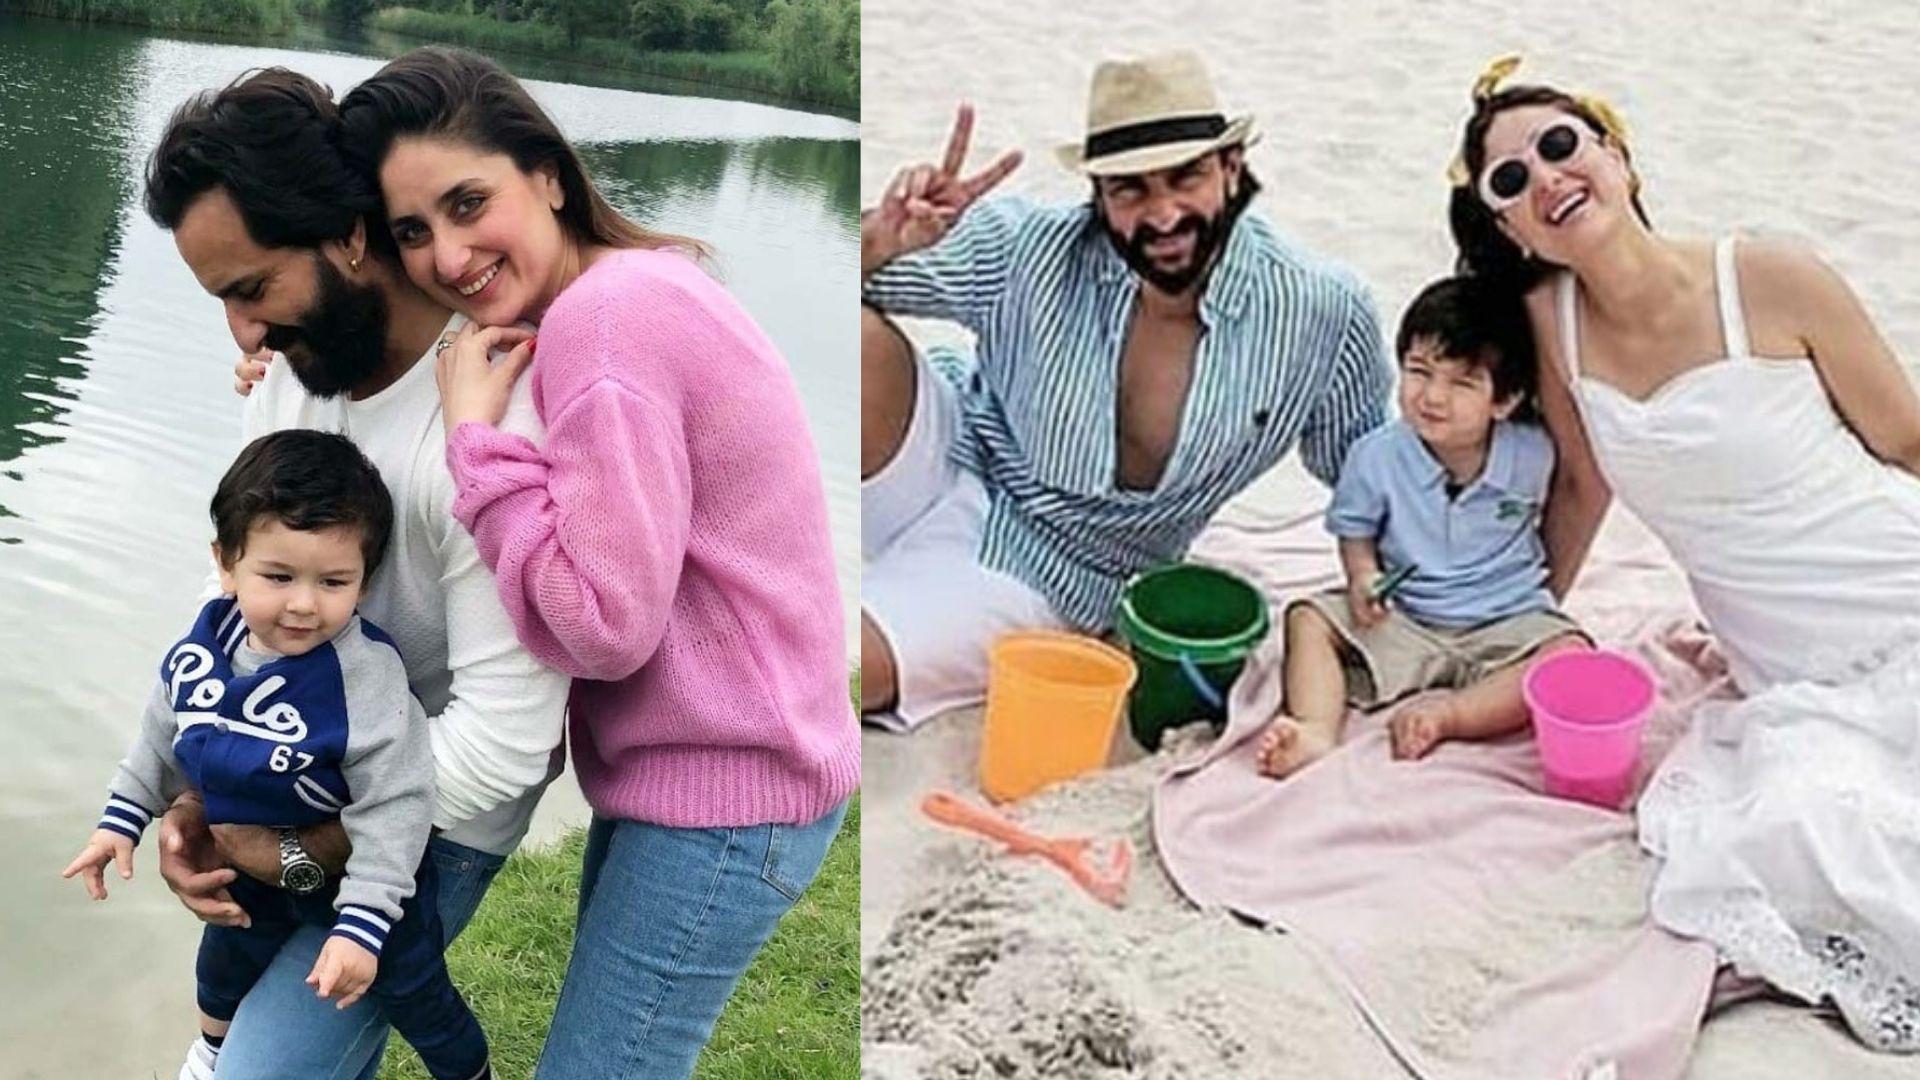 After A Great Vacation In The Maldives, Kareena Kapoor Khan And Saif Ali Khan Are Back To The Bay